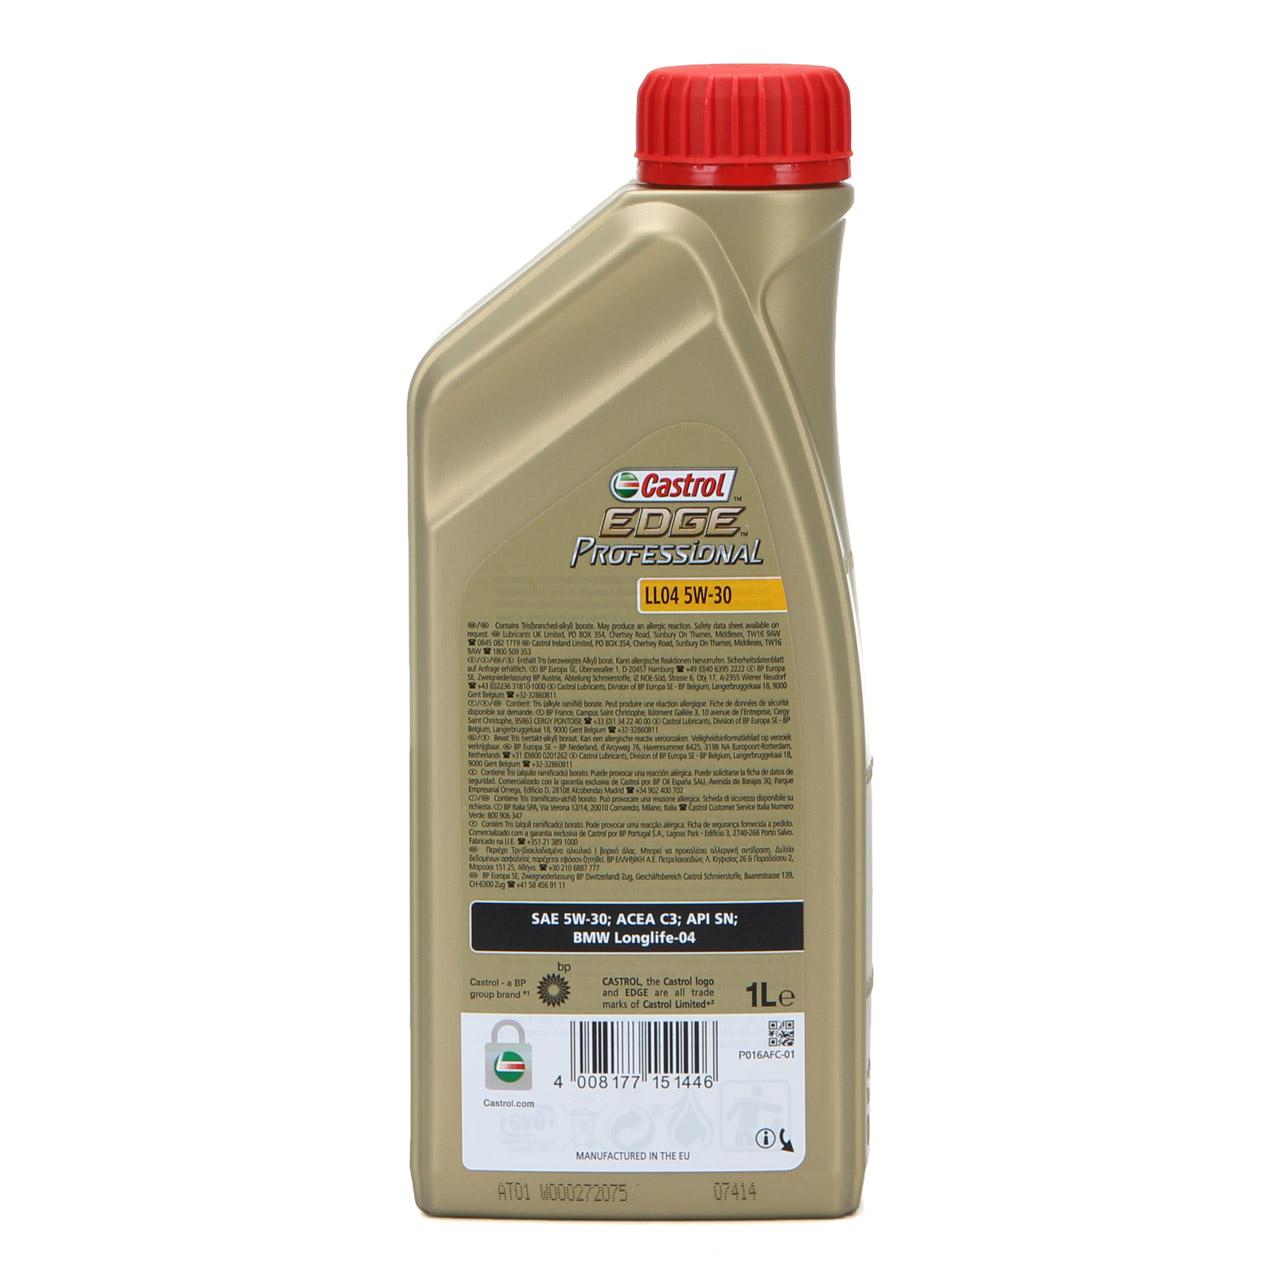 CASTROL EDGE Professional Motoröl Öl für BMW Longlife IV LL04 5W-30 - 1 Liter